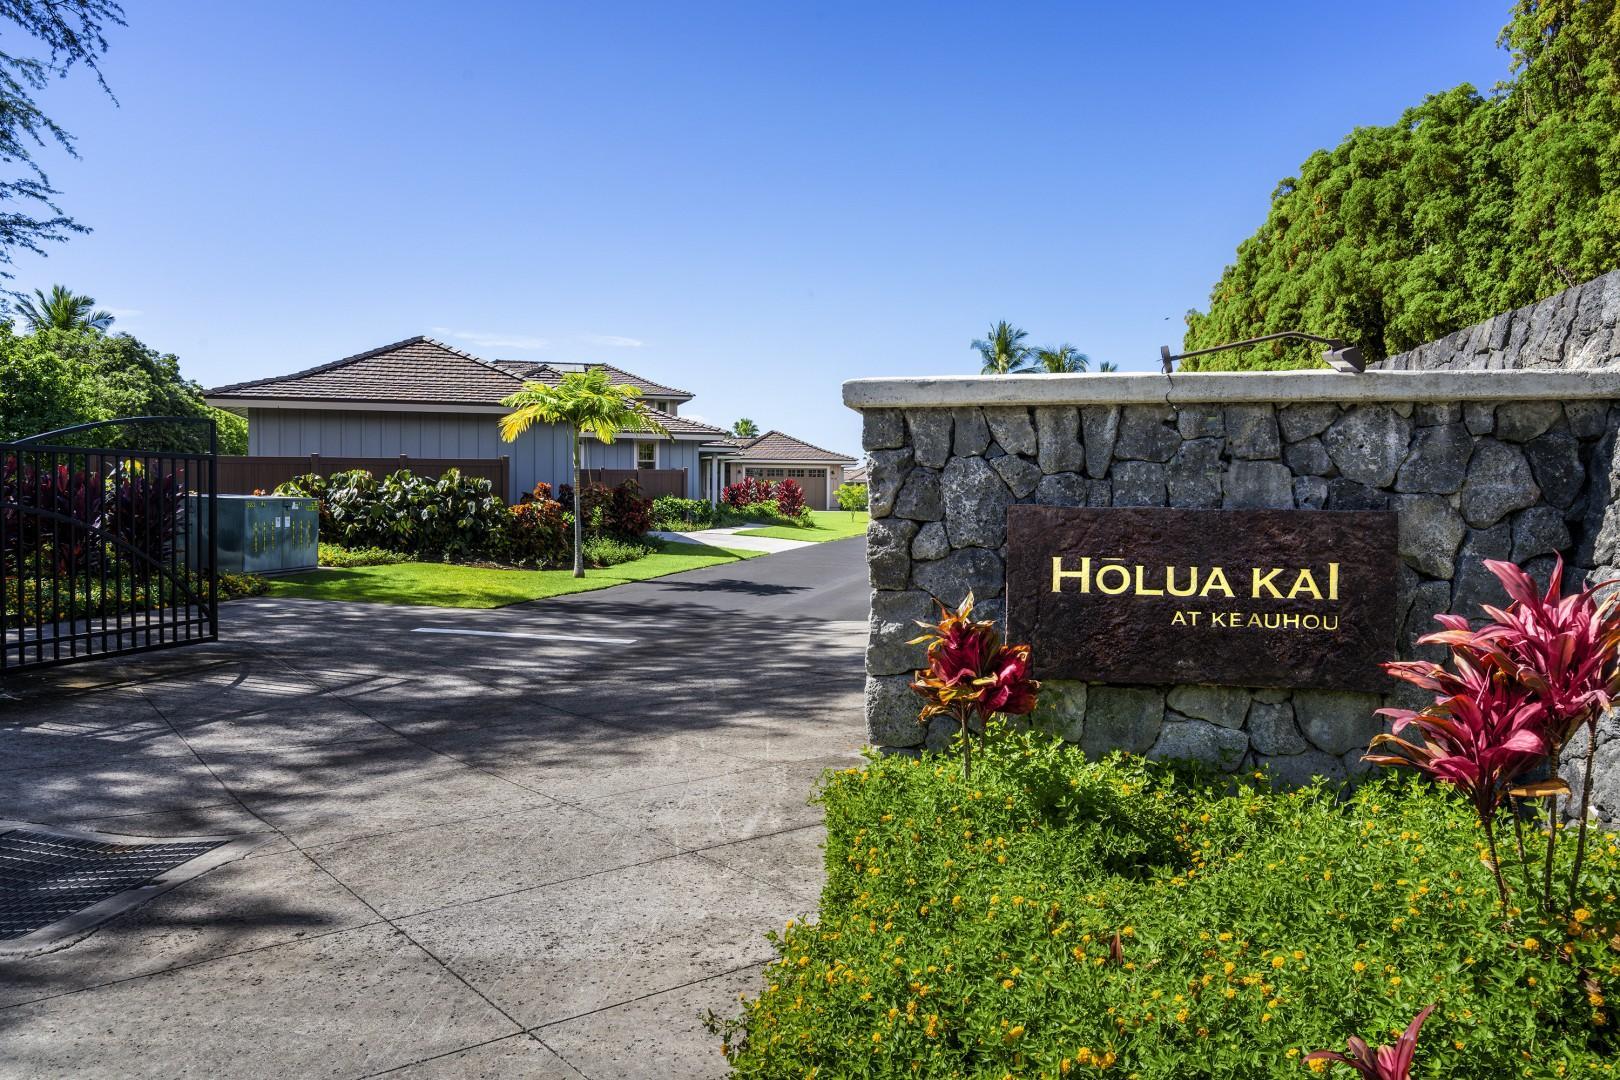 Holua Kai Gate L